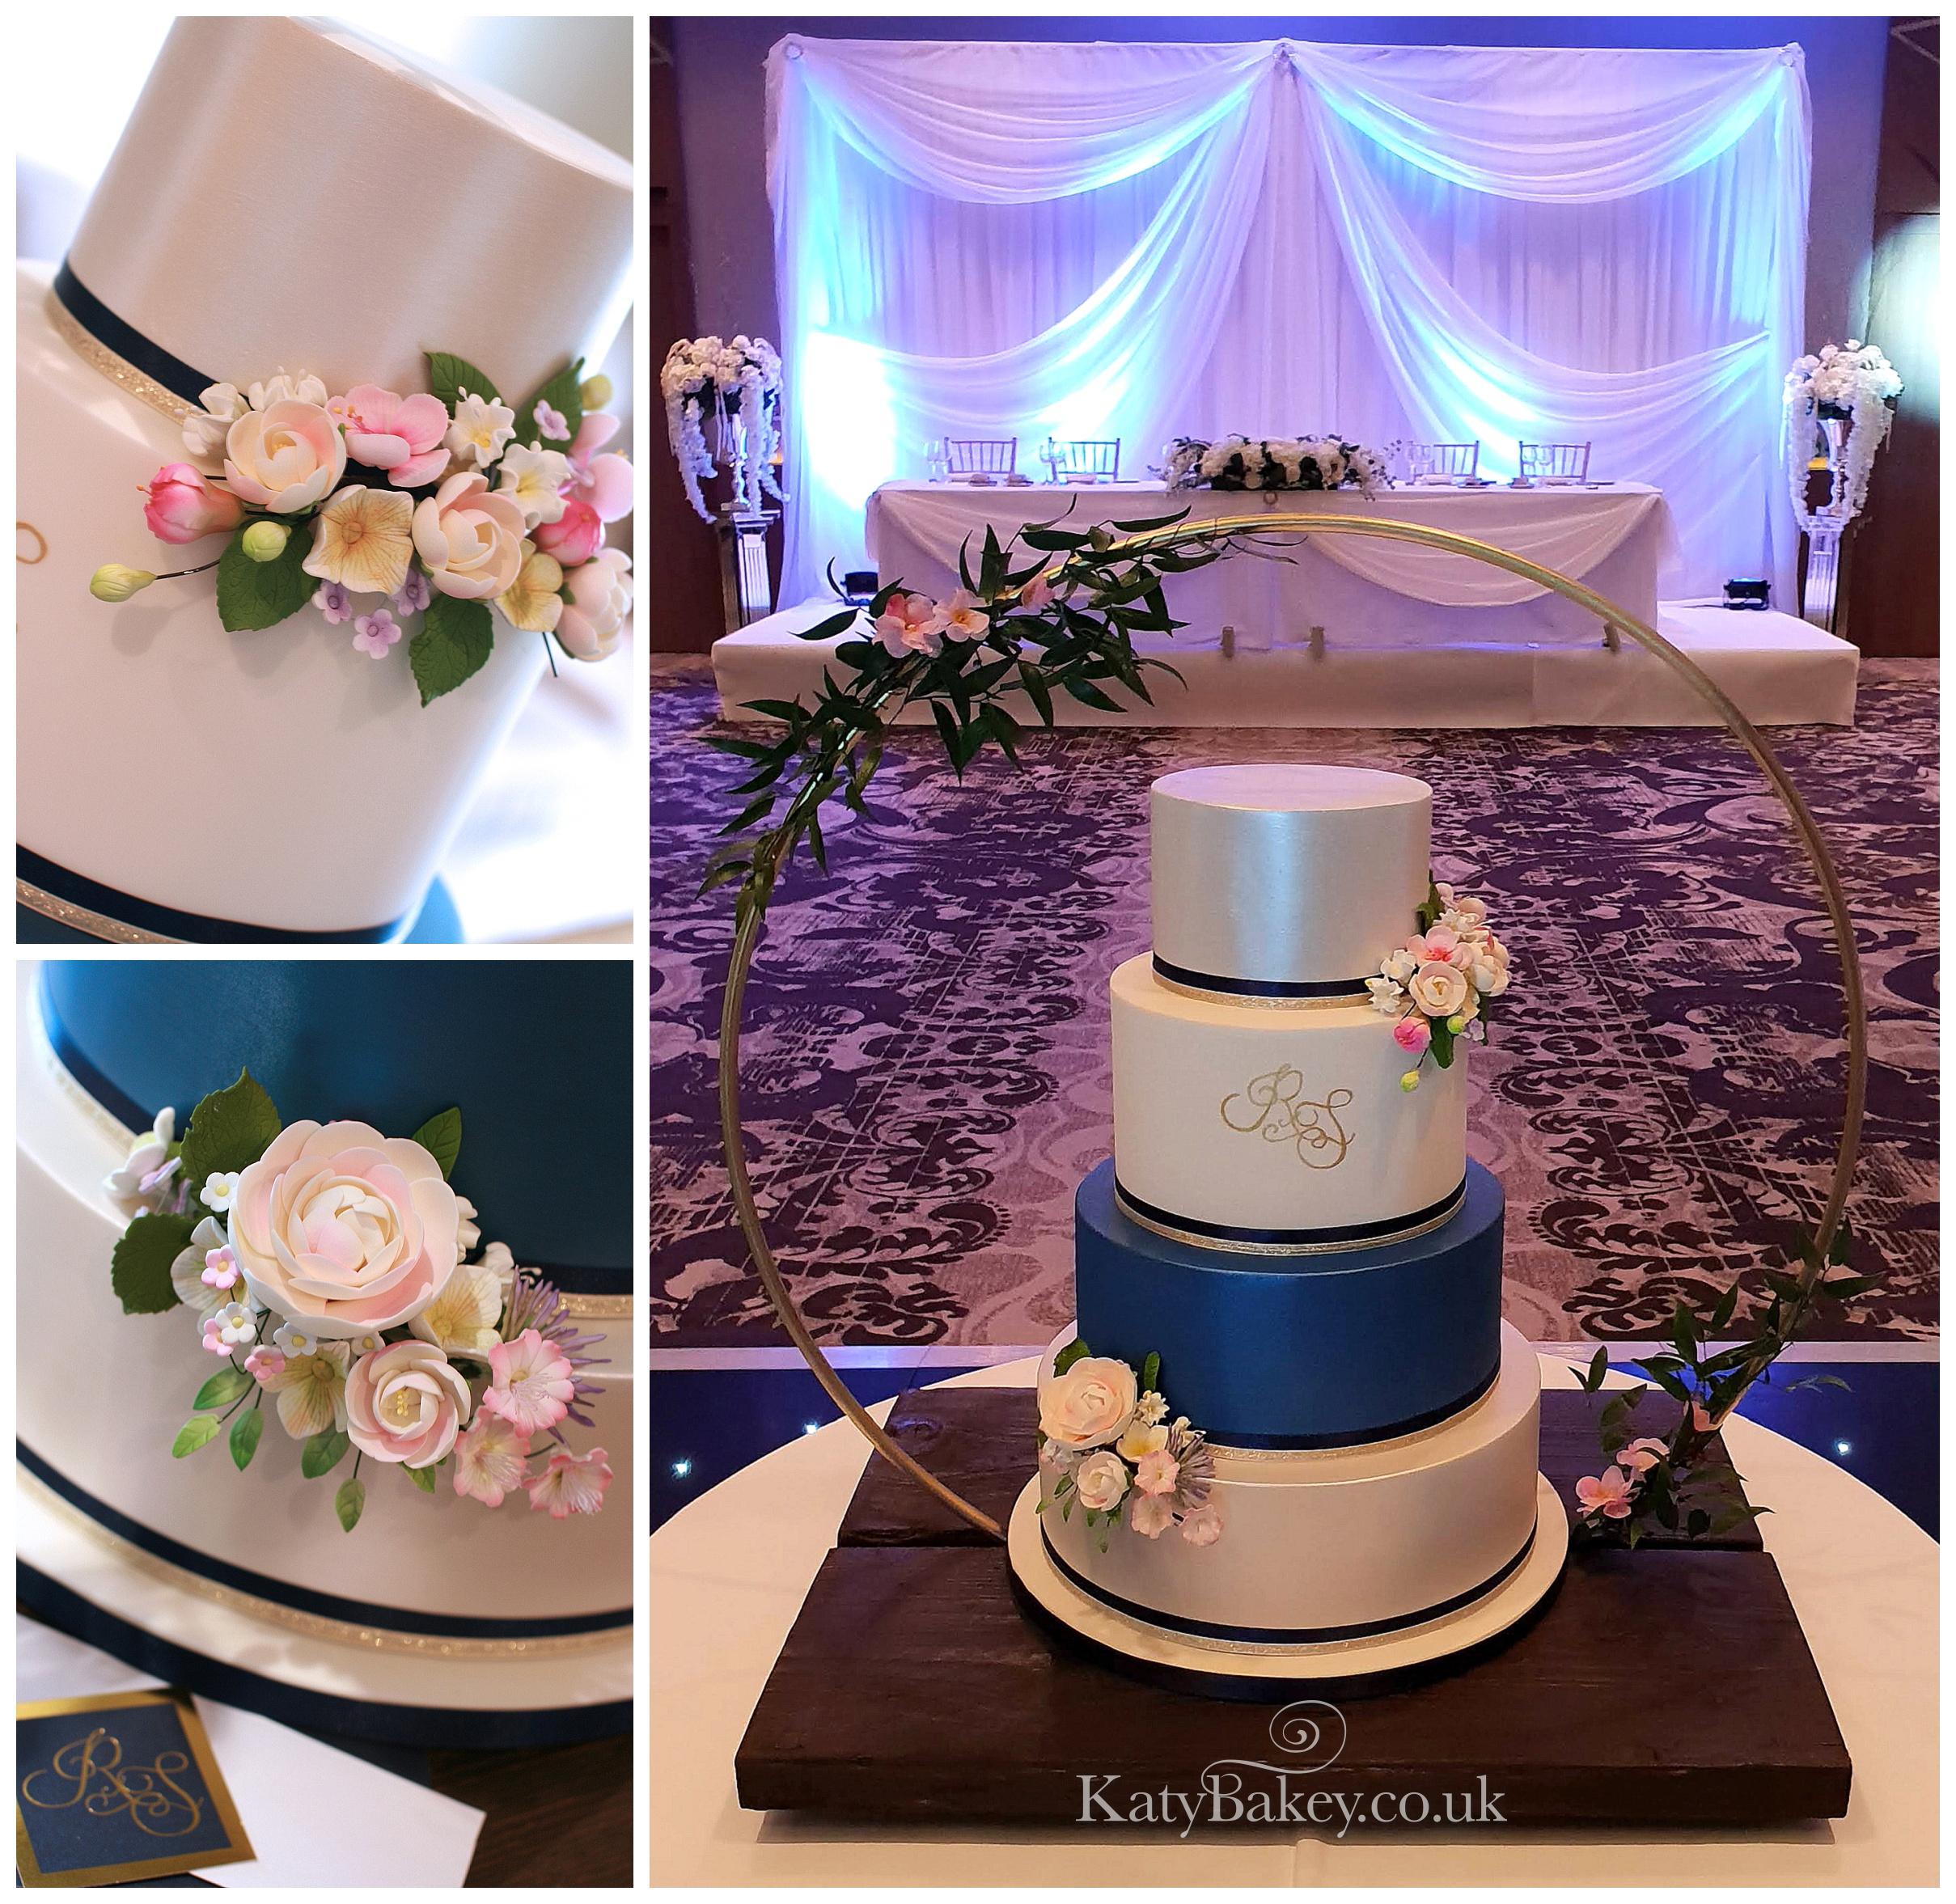 Wedding Cake Class: Bespoke Celebration And Wedding Cakes And Classes